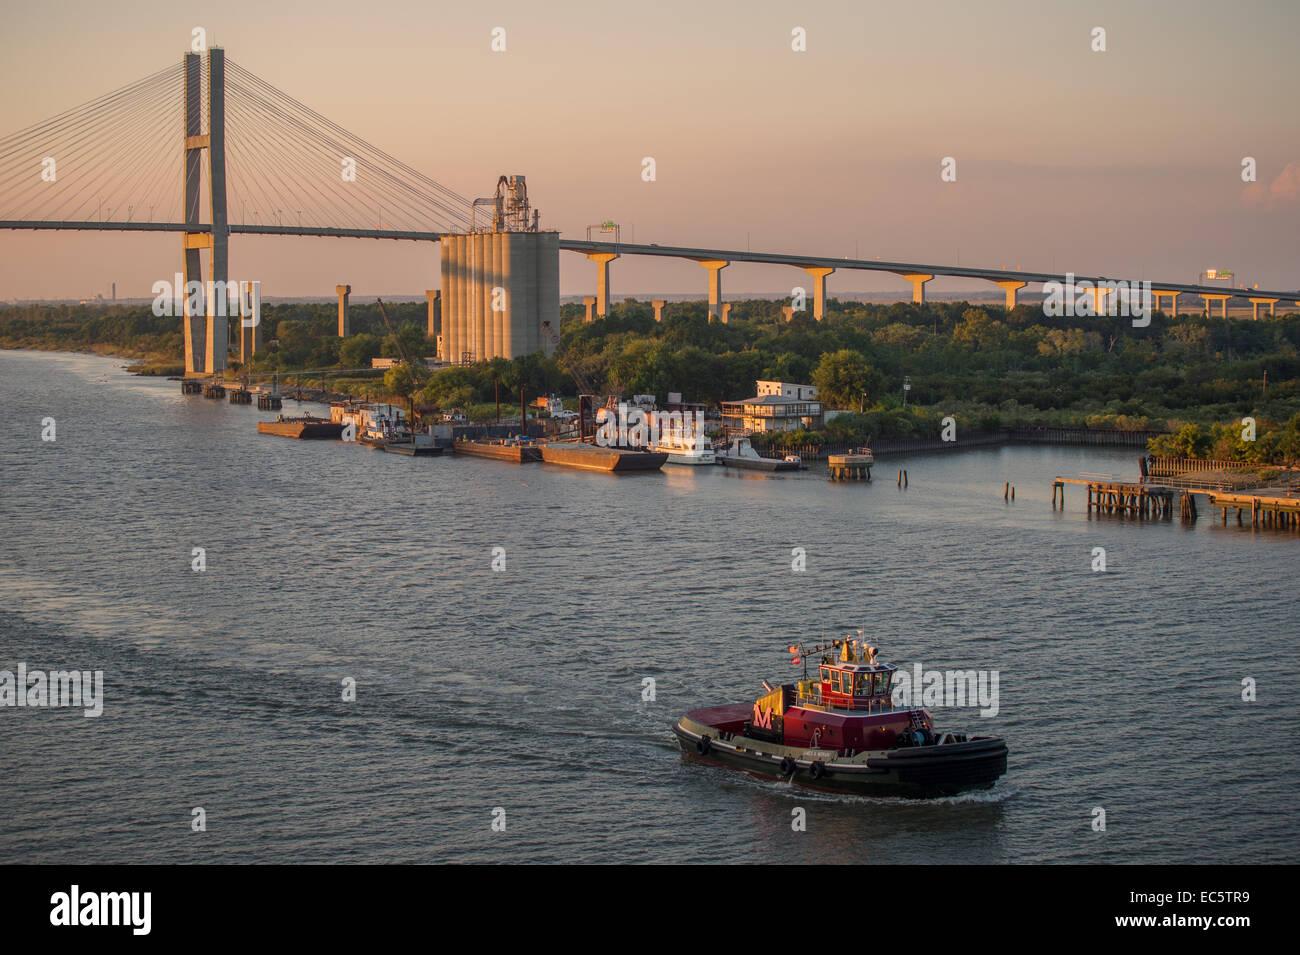 Pilot boat at dusk on Savannah River with Eugene Talmadge Memorial Bridge in the background. - Stock Image